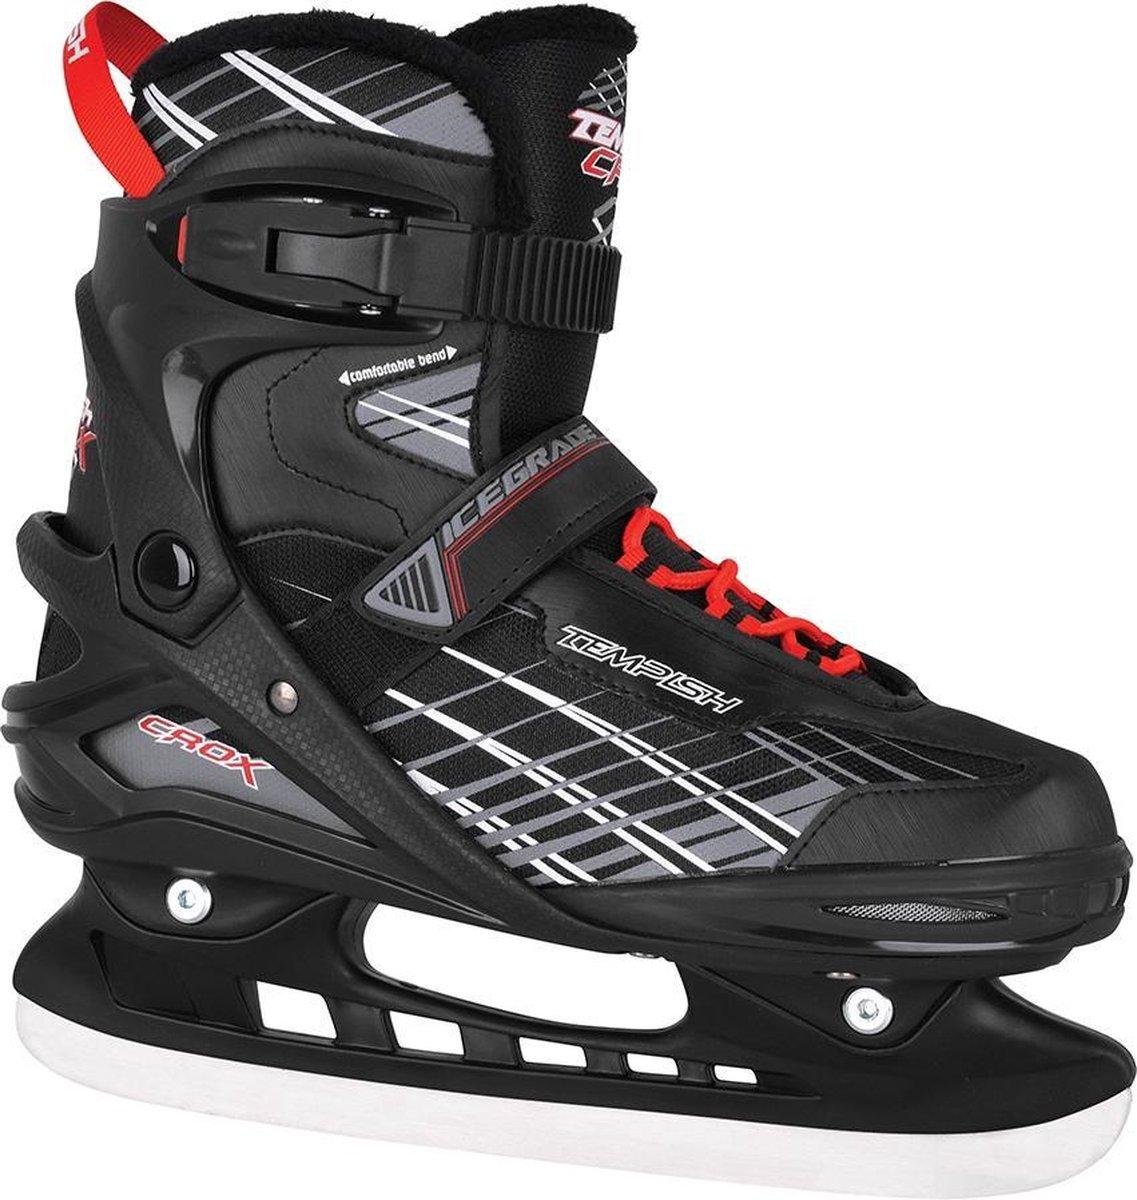 Tempish IJshockeyschaatsen CROX Zwart/Rood 38